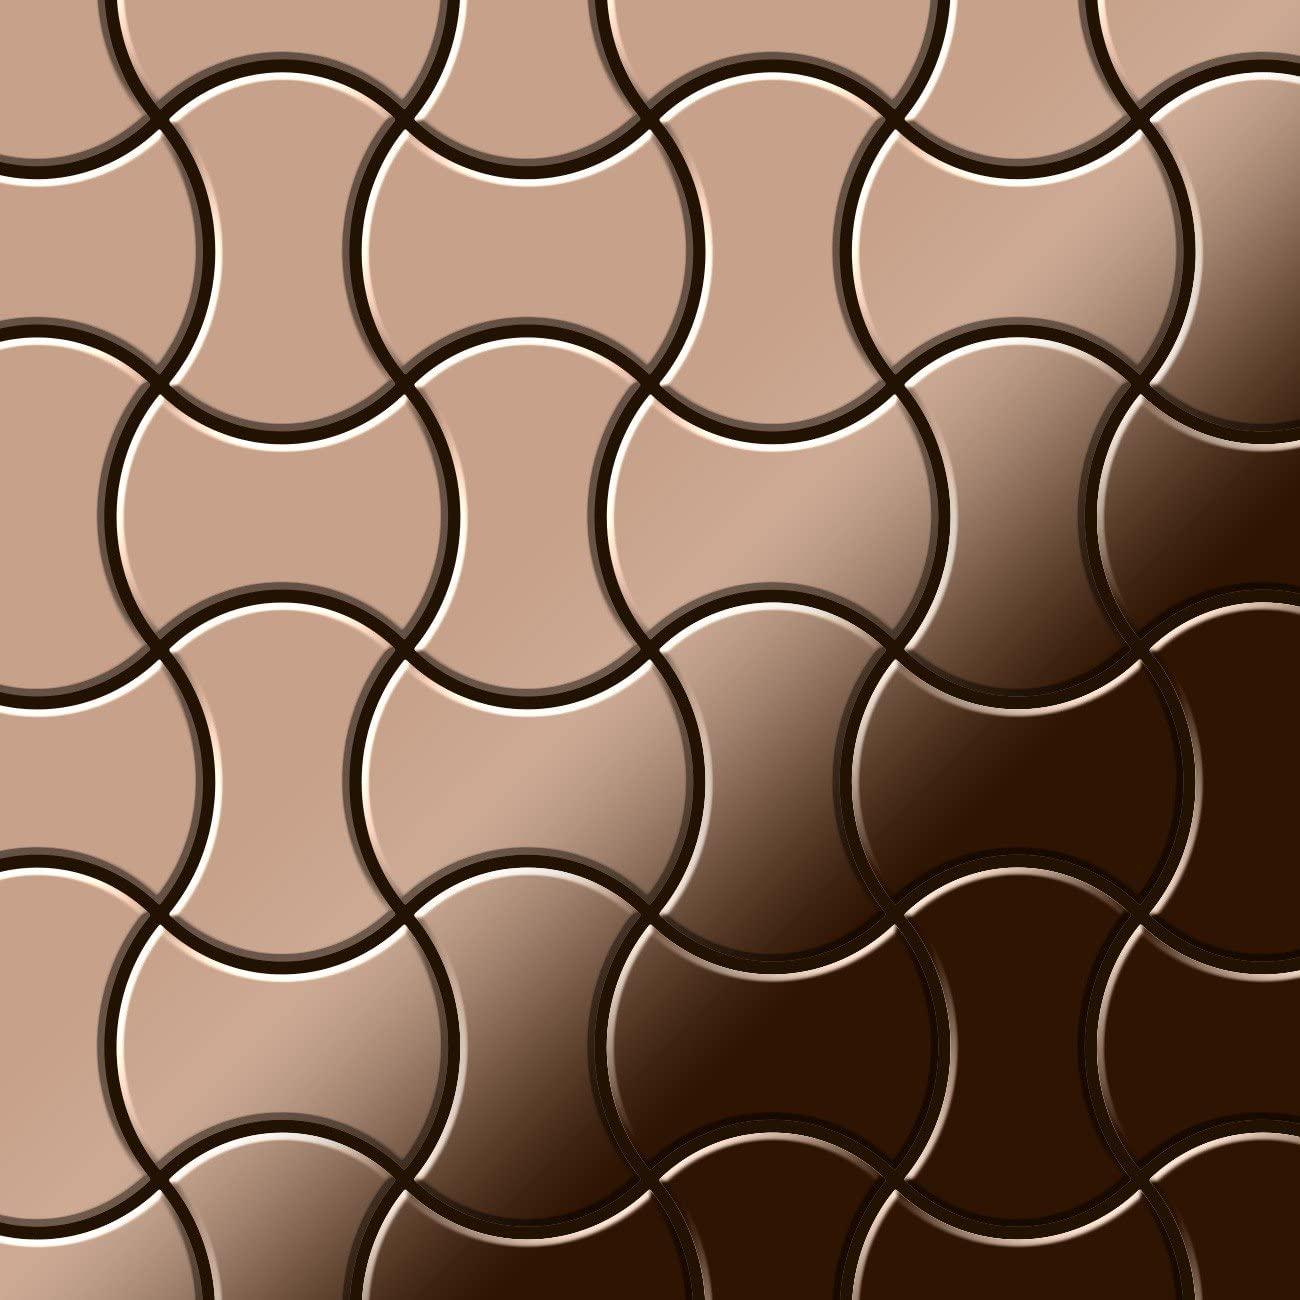 Mosaic Tile massiv Metal Titanium Amber Mirror Copper 1.6mm Thick ALLOY Infinit-Ti-AM Designed by Karim Rashid